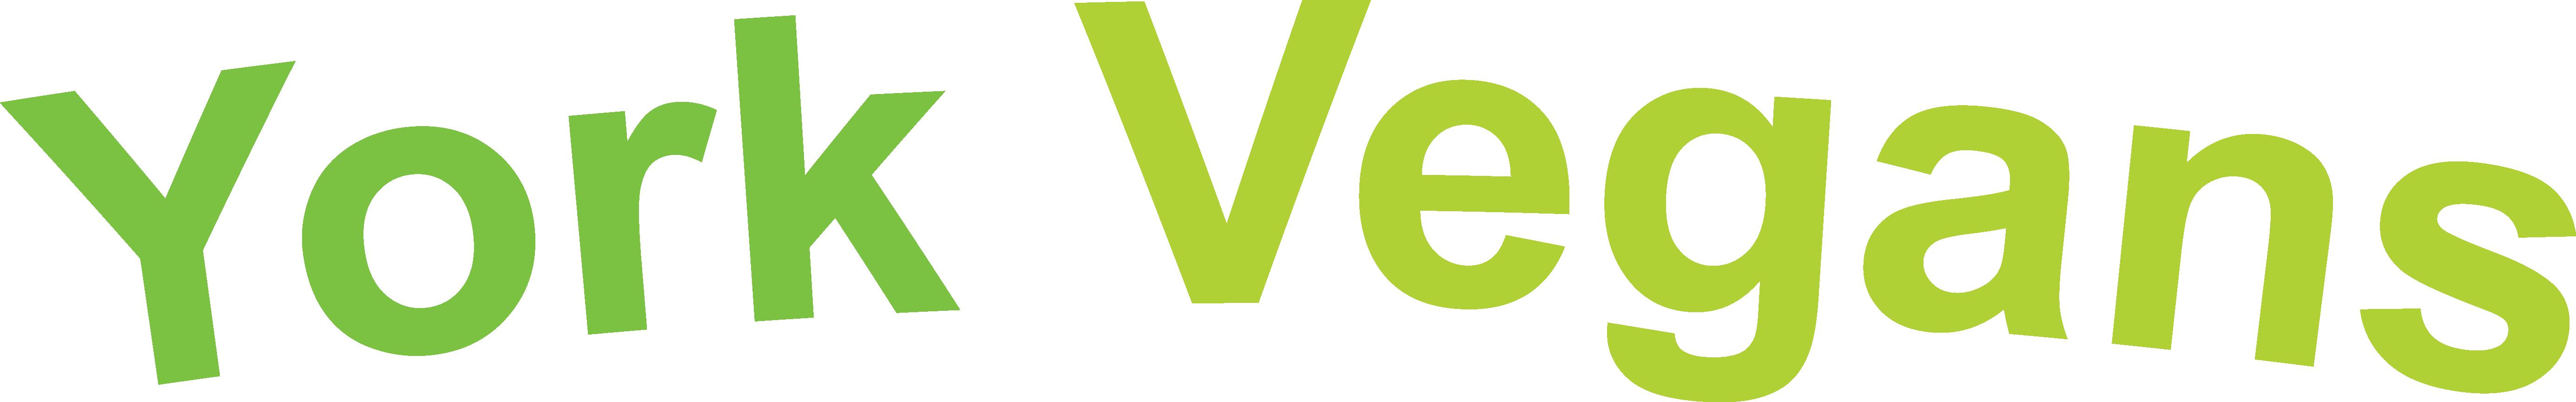 York Vegans